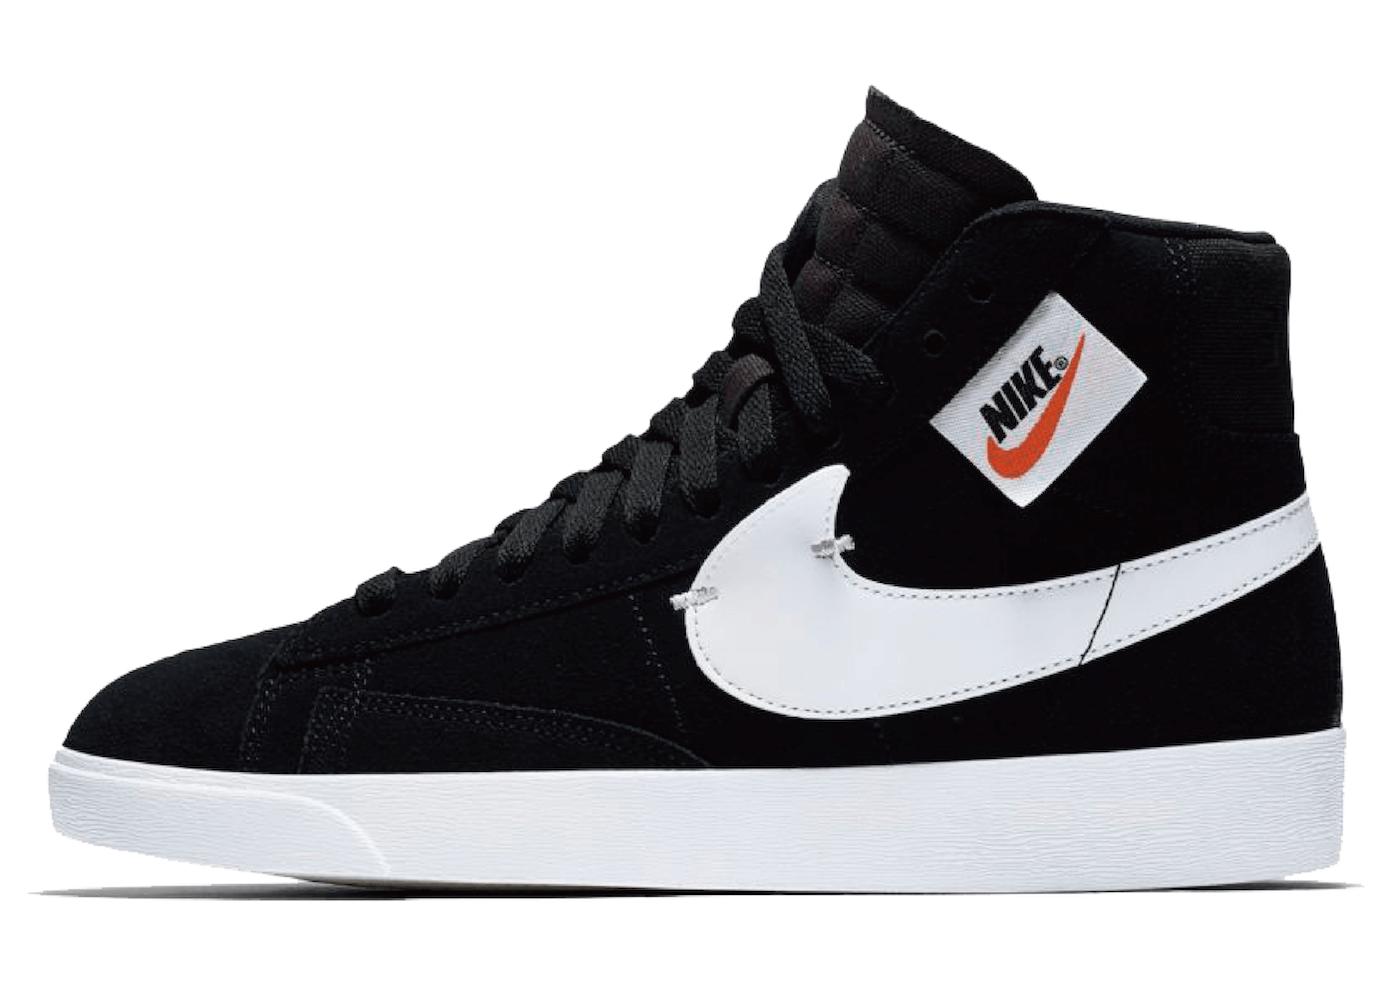 Nike Blazer Mid Rebel Black White (W)の写真